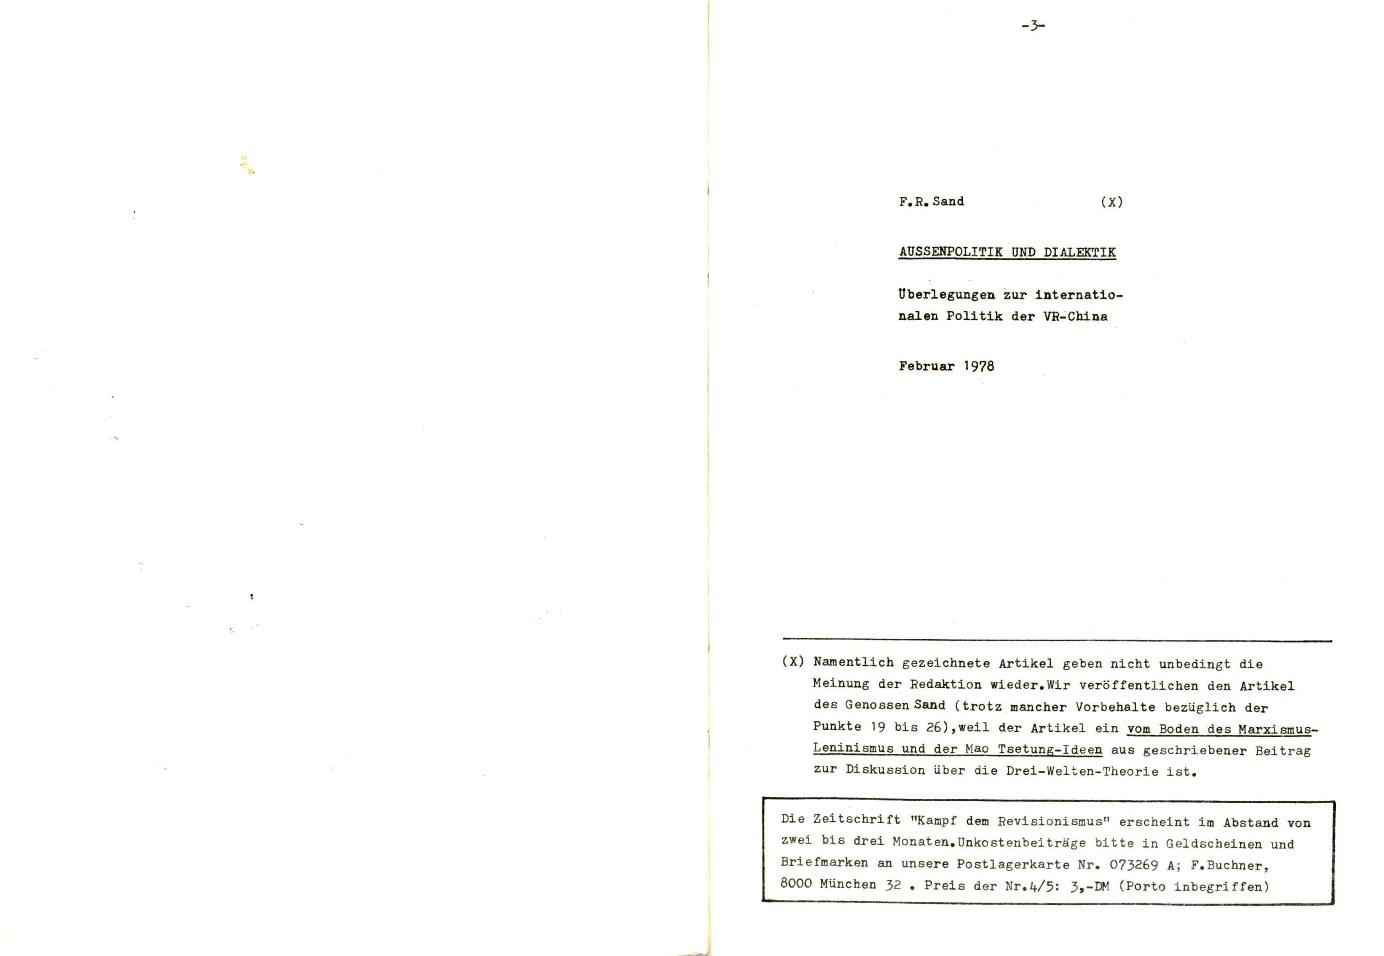 Muenchen_Kampf_dem_Revisionismus_1978_04_05_03